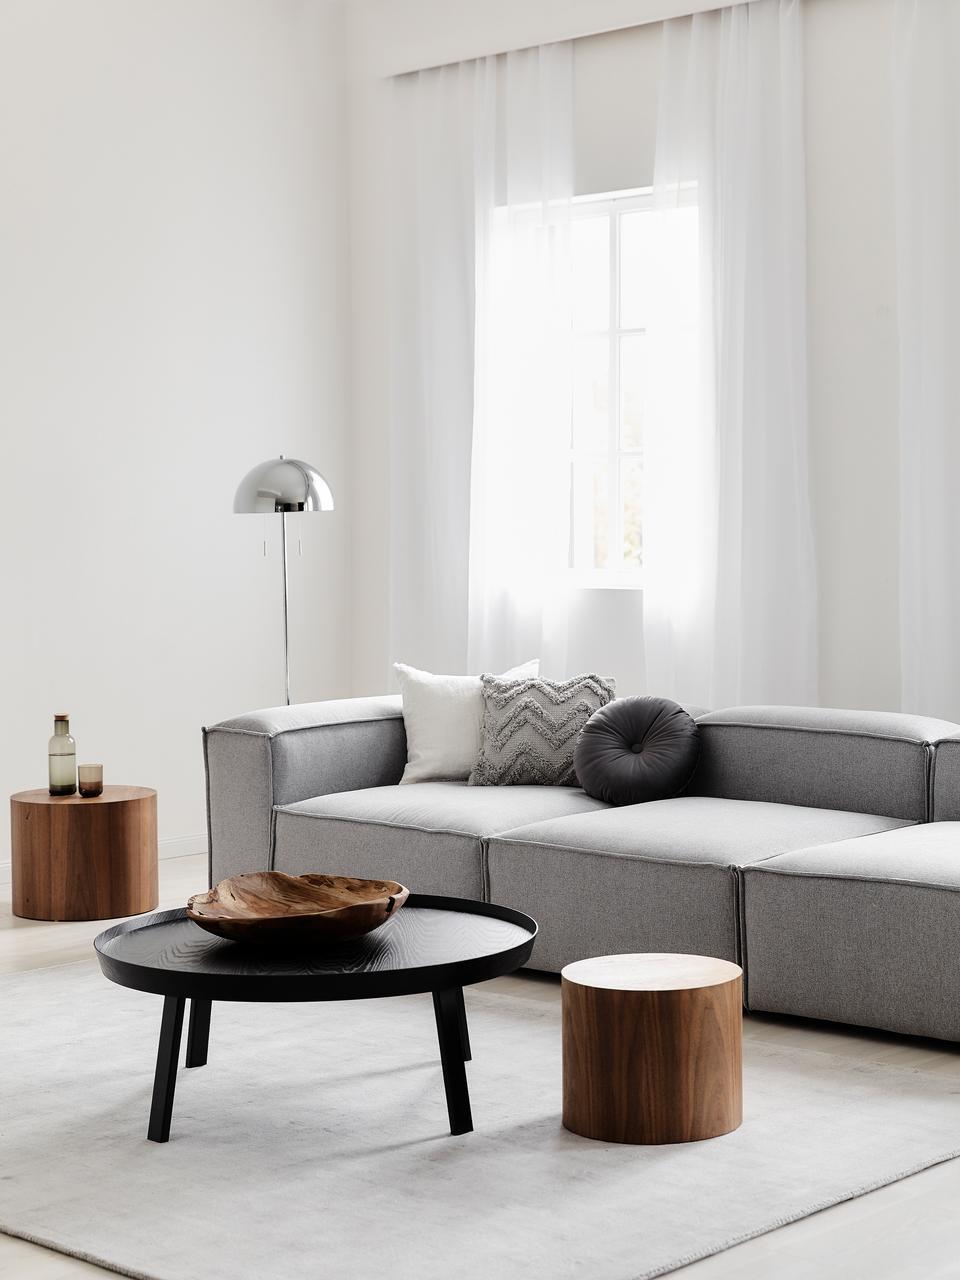 Modulares Sofa Lennon (4-Sitzer), Bezug: Polyester Der hochwertige, Gestell: Massives Kiefernholz, Spe, Füße: Kunststoff, Webstoff Hellgrau, B 326 x T 119 cm